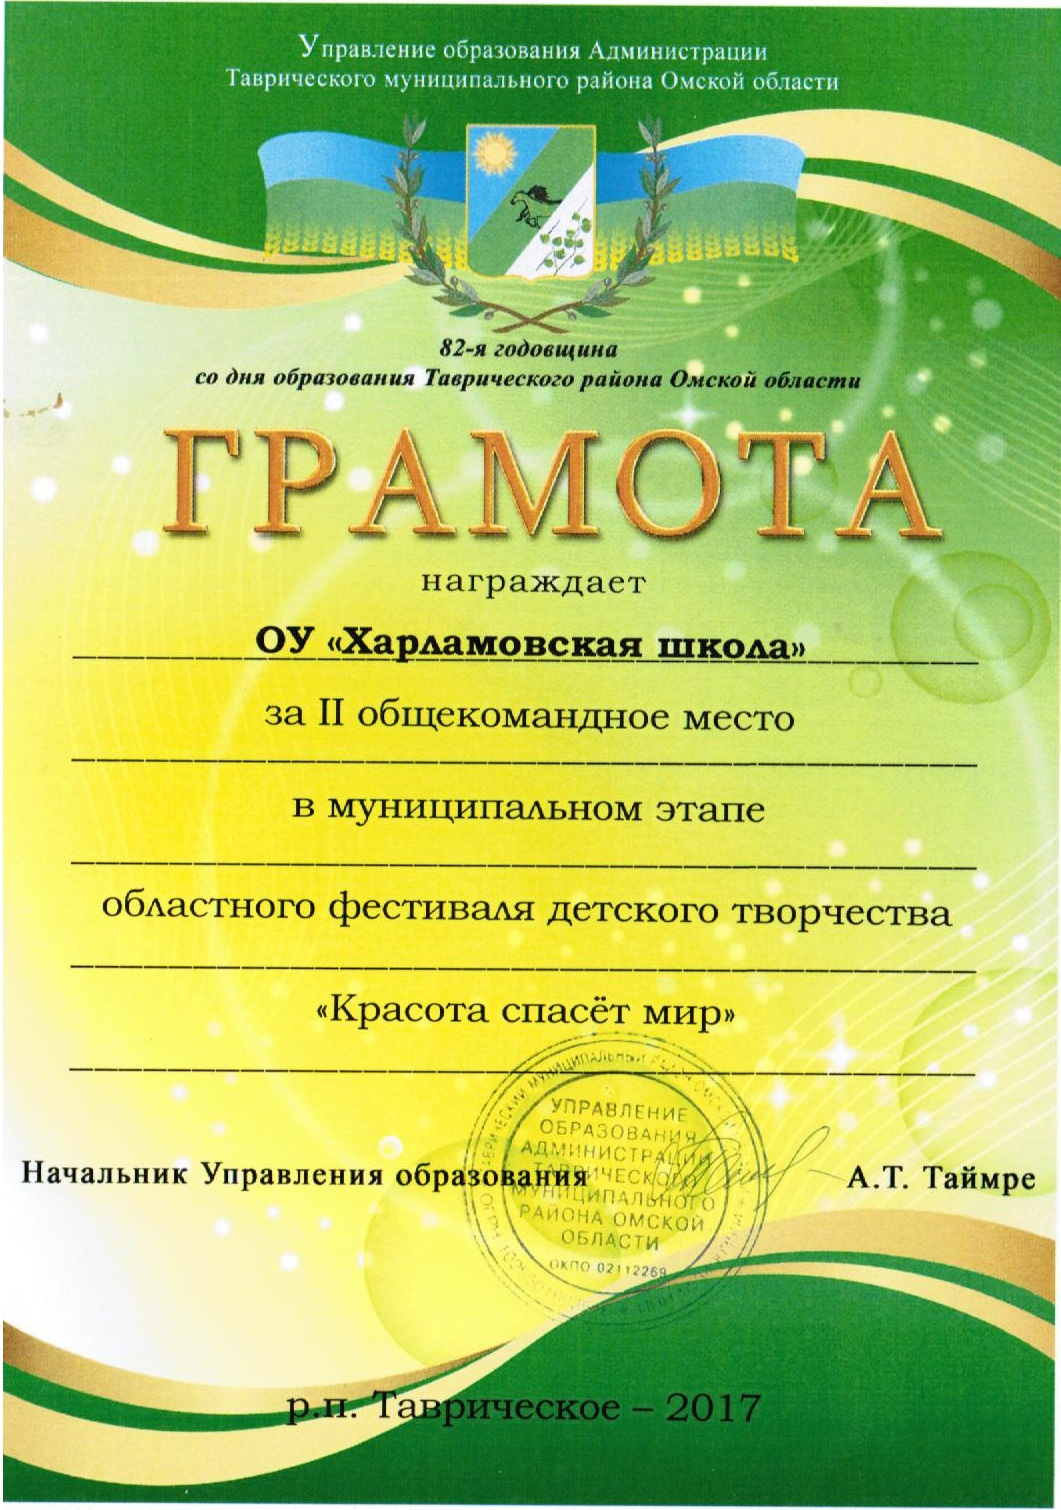 Конкурс по озеленению школы